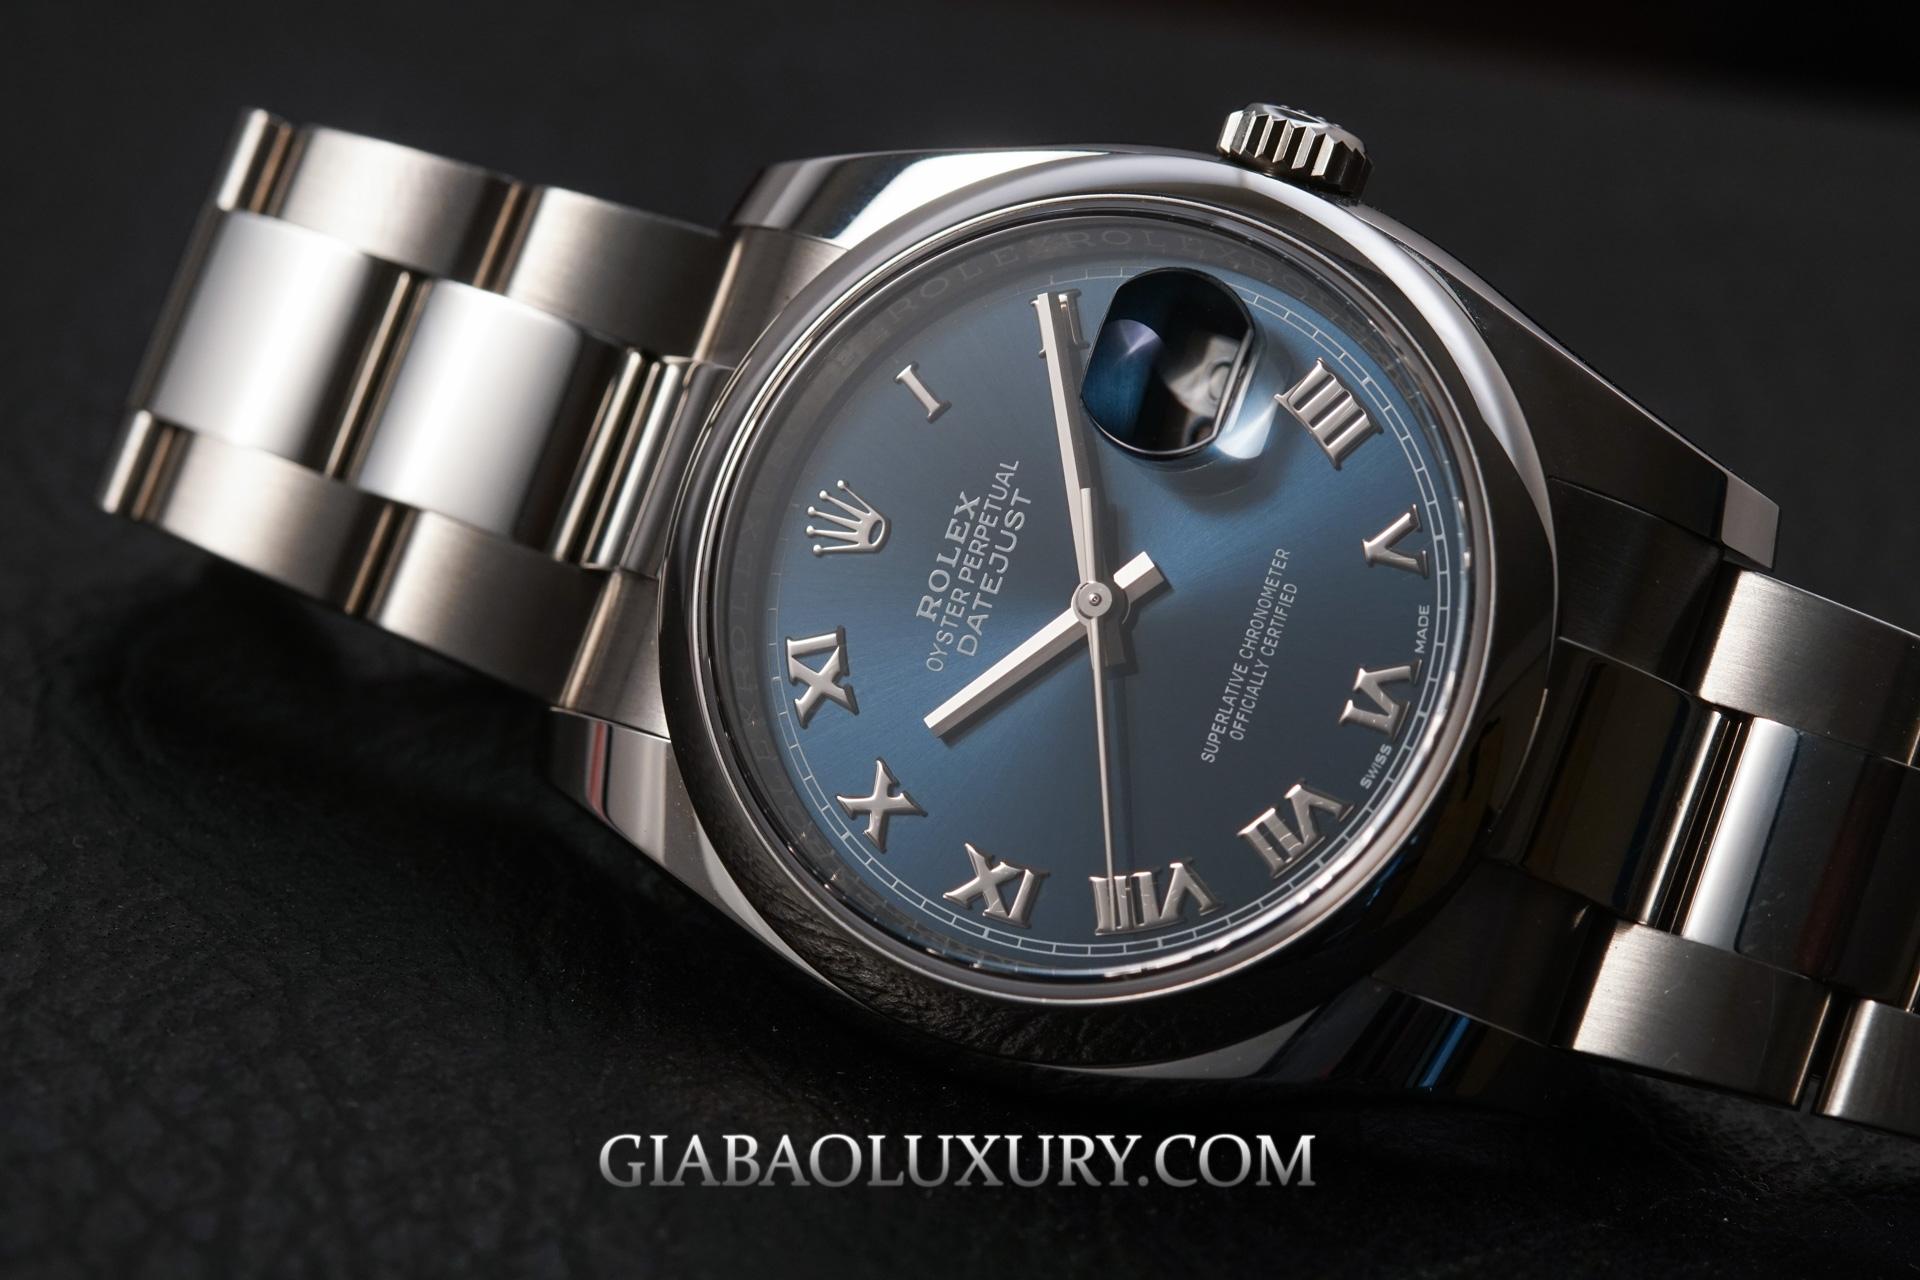 Đồng Hồ Rolex Datejust 36 116200 Mặt Số Xanh Cọc Số La Mã Dây Đeo Oyster